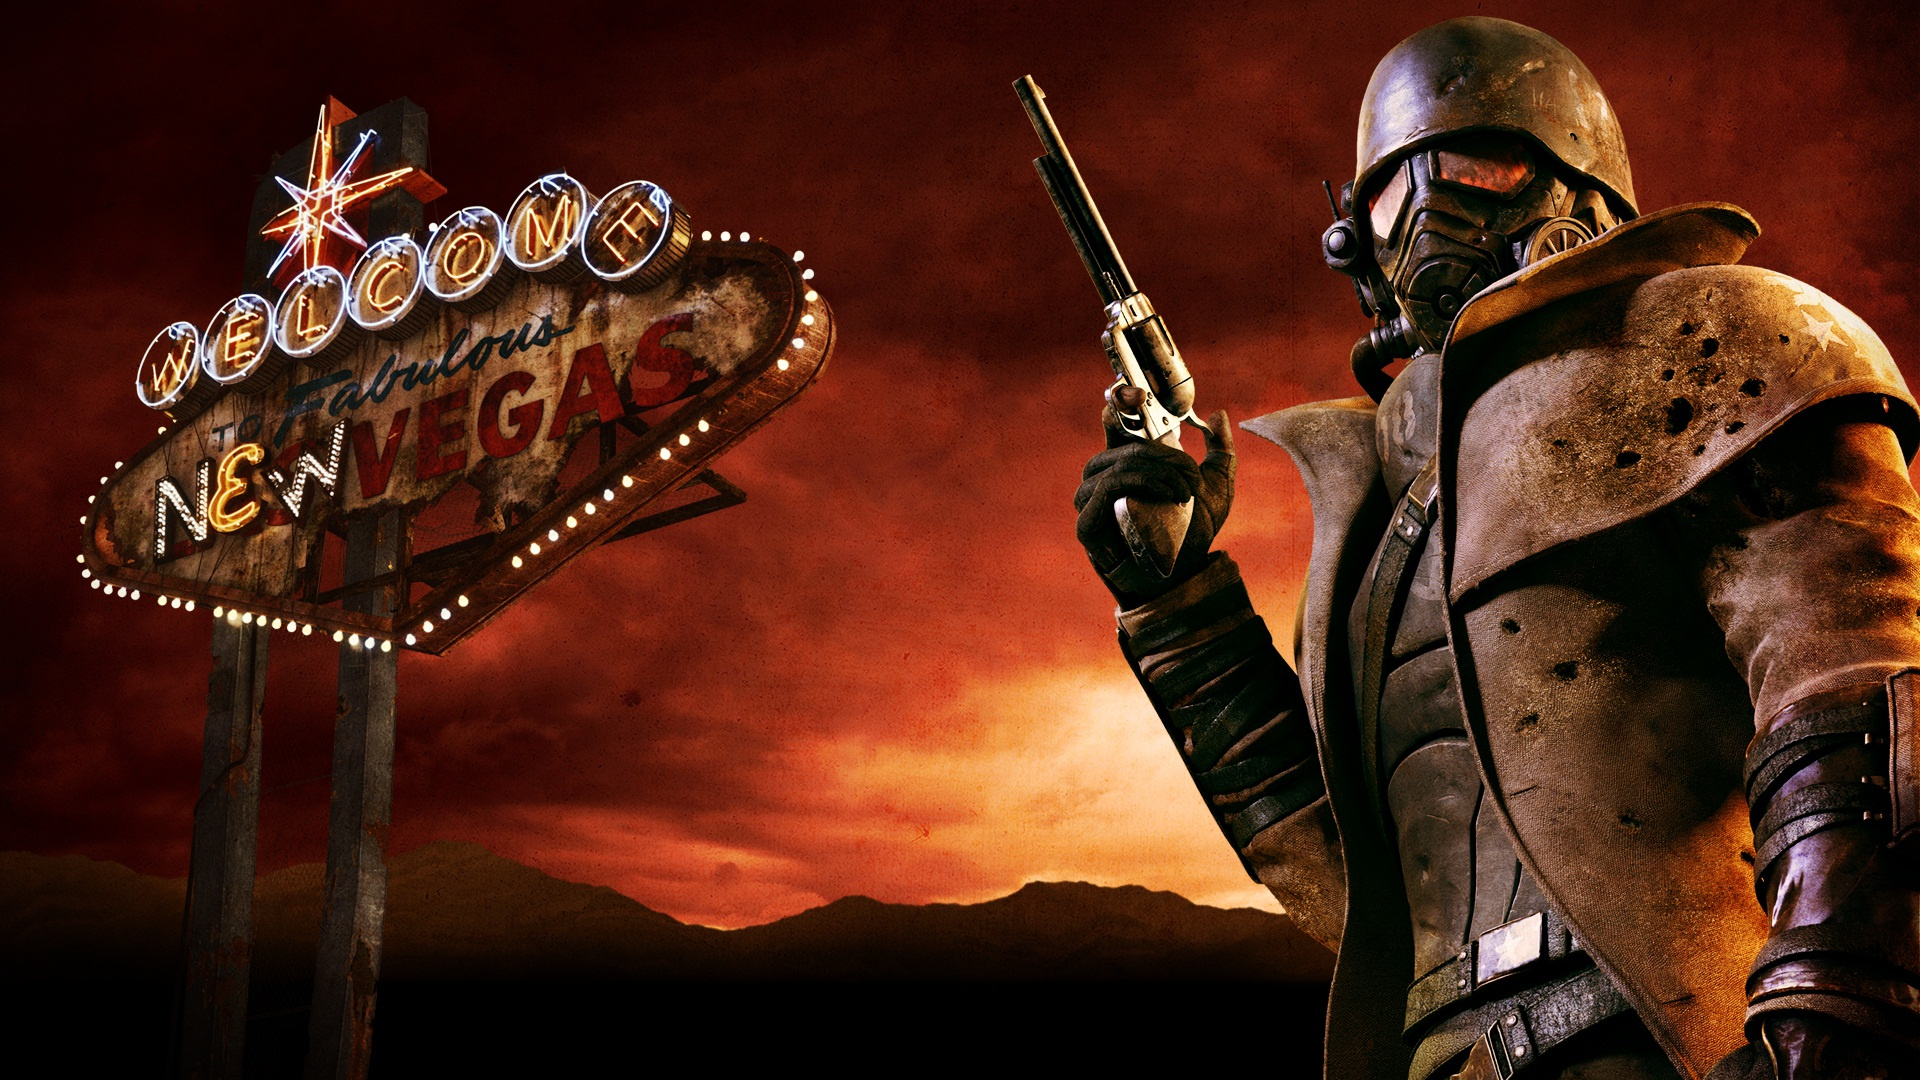 Во что мы играли 5, 10, 15 и 20 лет назад: Life is Strange, Fallout: New Vegas, F.E.A.R., Command & Conquer: Red Alert 2